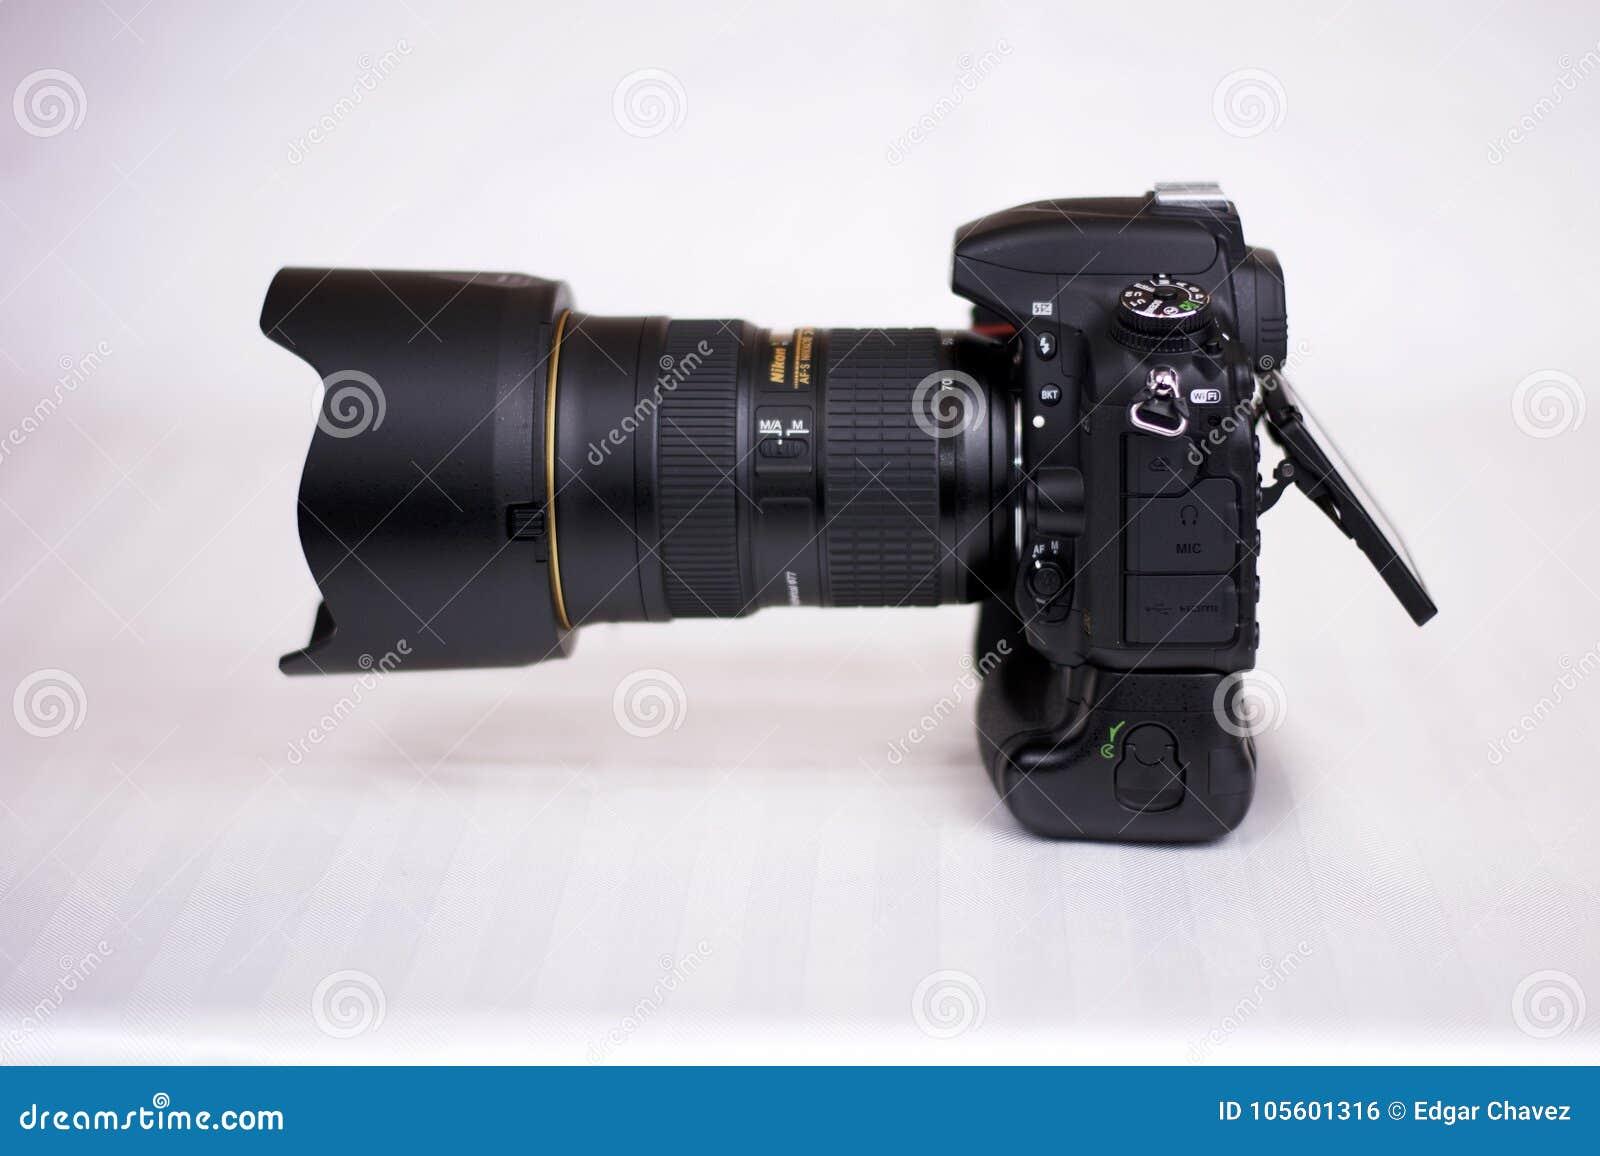 Nikon D750 with MB16 editorial photo  Image of nikon - 105601316